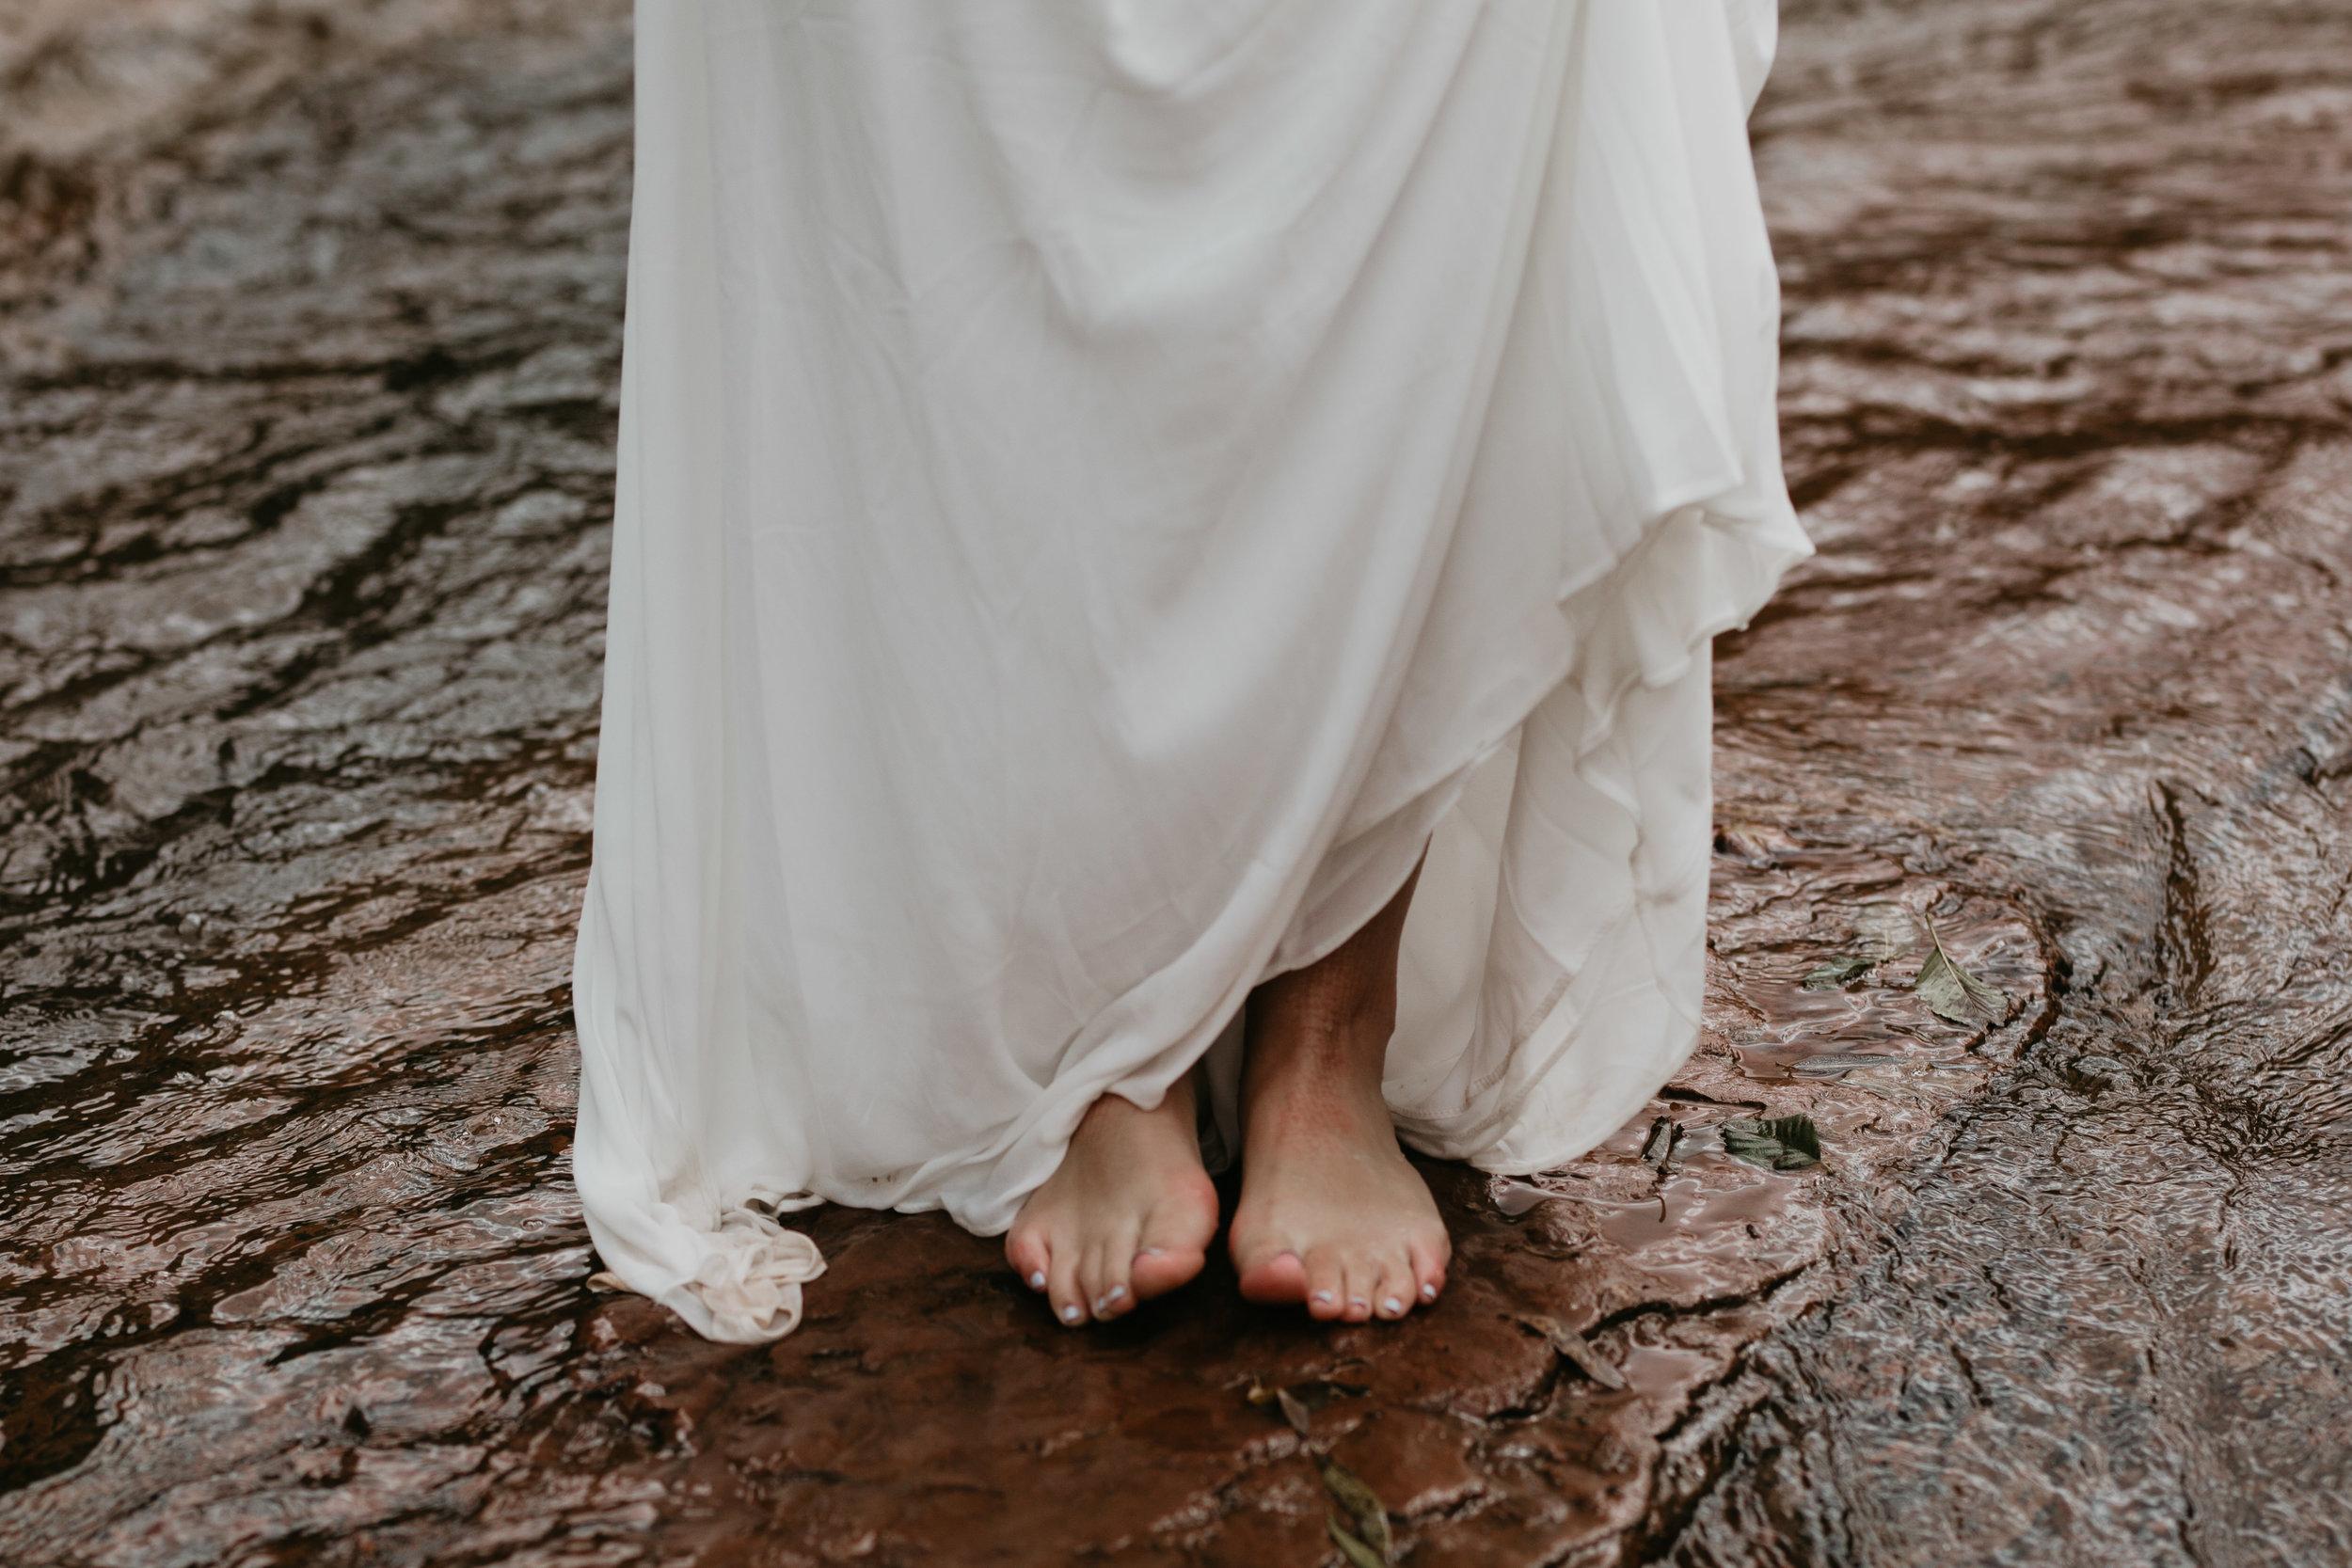 nicole-daacke-photography-sedona-arizona-destination-elopement-wedding-photographer-catherdral-rock-hiking-elopement-sedona-river-elopement-photos-desert-rock-wedding-photographer-laid-back-spontaneous-elopement-104.jpg